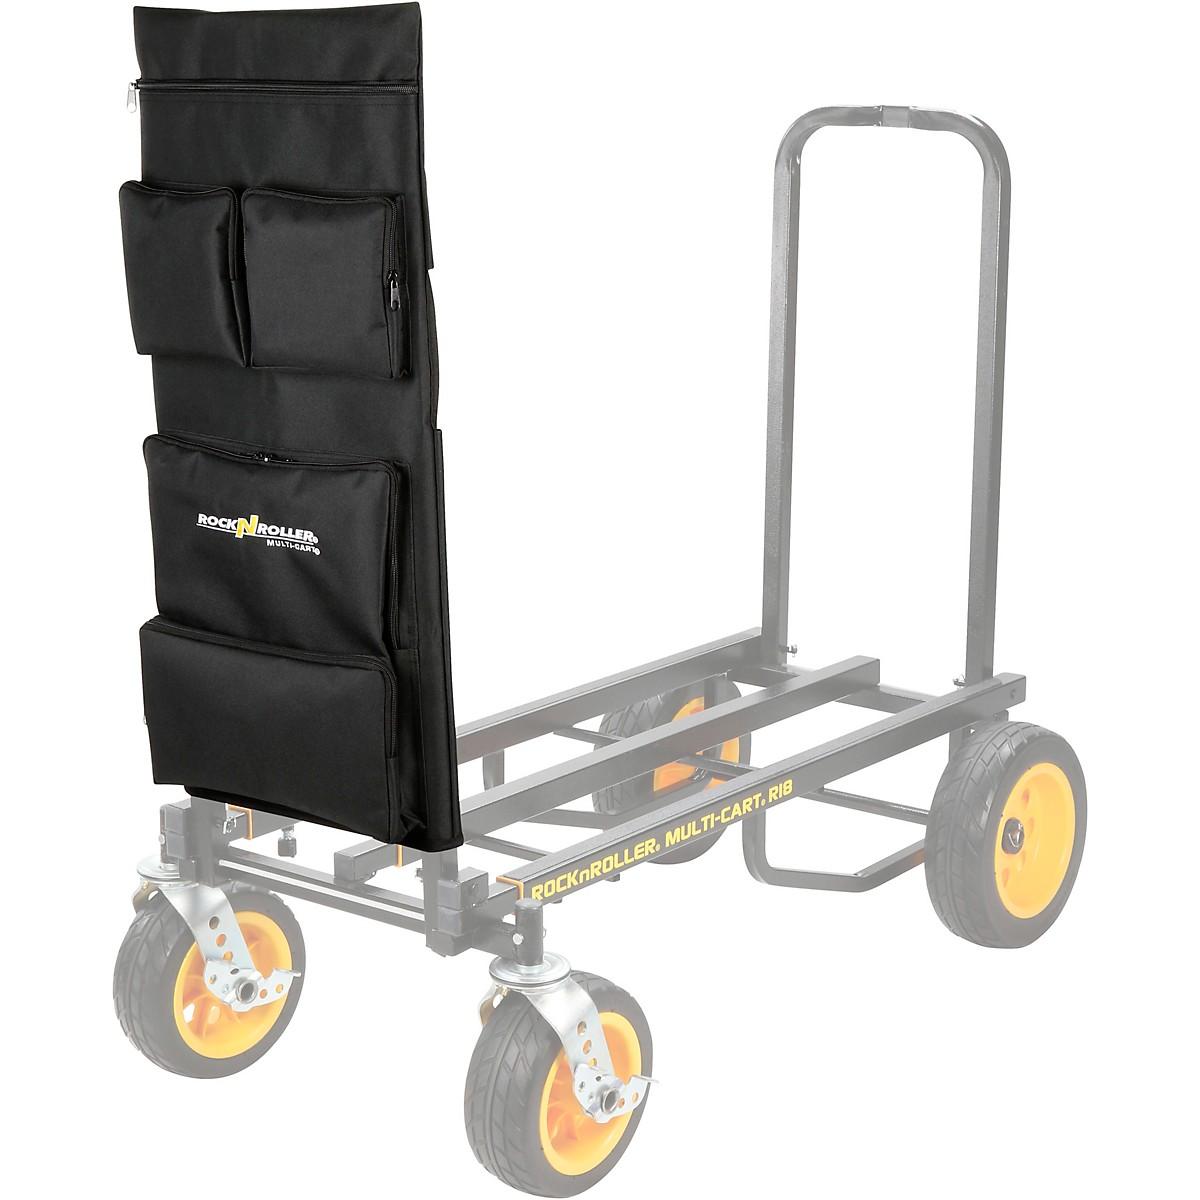 Rock N Roller RSA-TAB14 Large Multi-Pocket Tool/Accessory Bag for R14, R16, R18 Carts